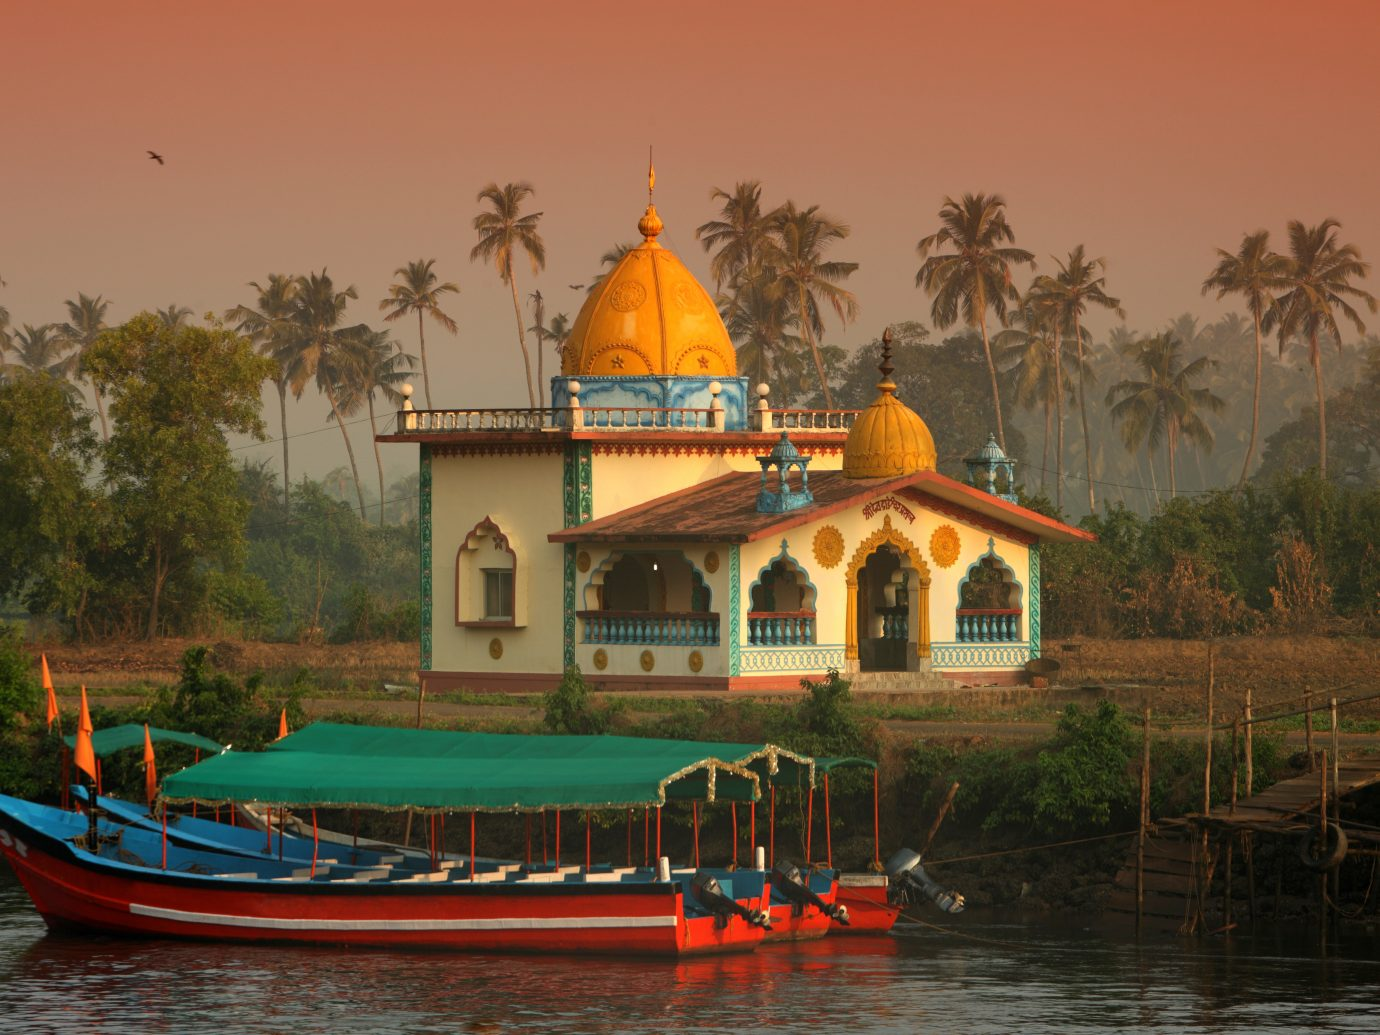 Hindu Temple on the water in Goa